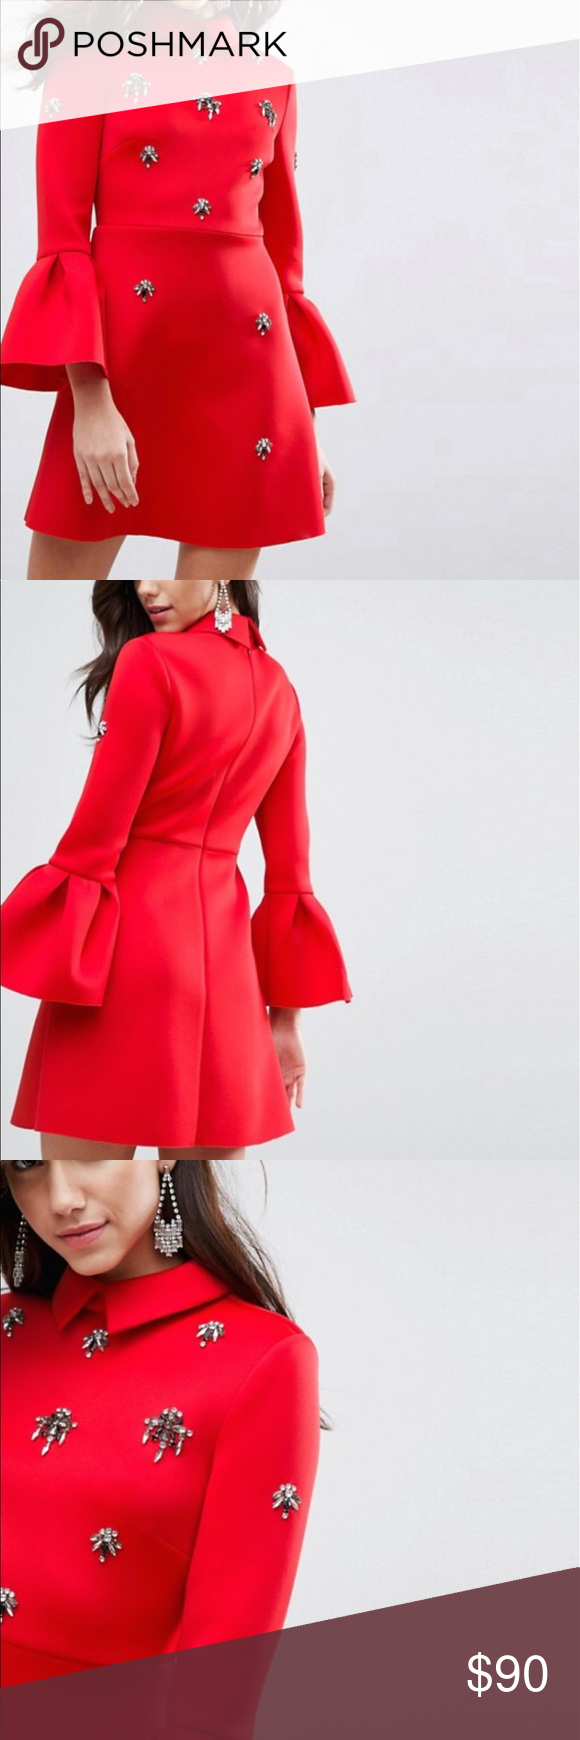 12f0583d2af ASOS Scuba Embellished A-Line Mini Dress Size 0 Brand new Comes in a size 0 ASOS  Dresses Mini